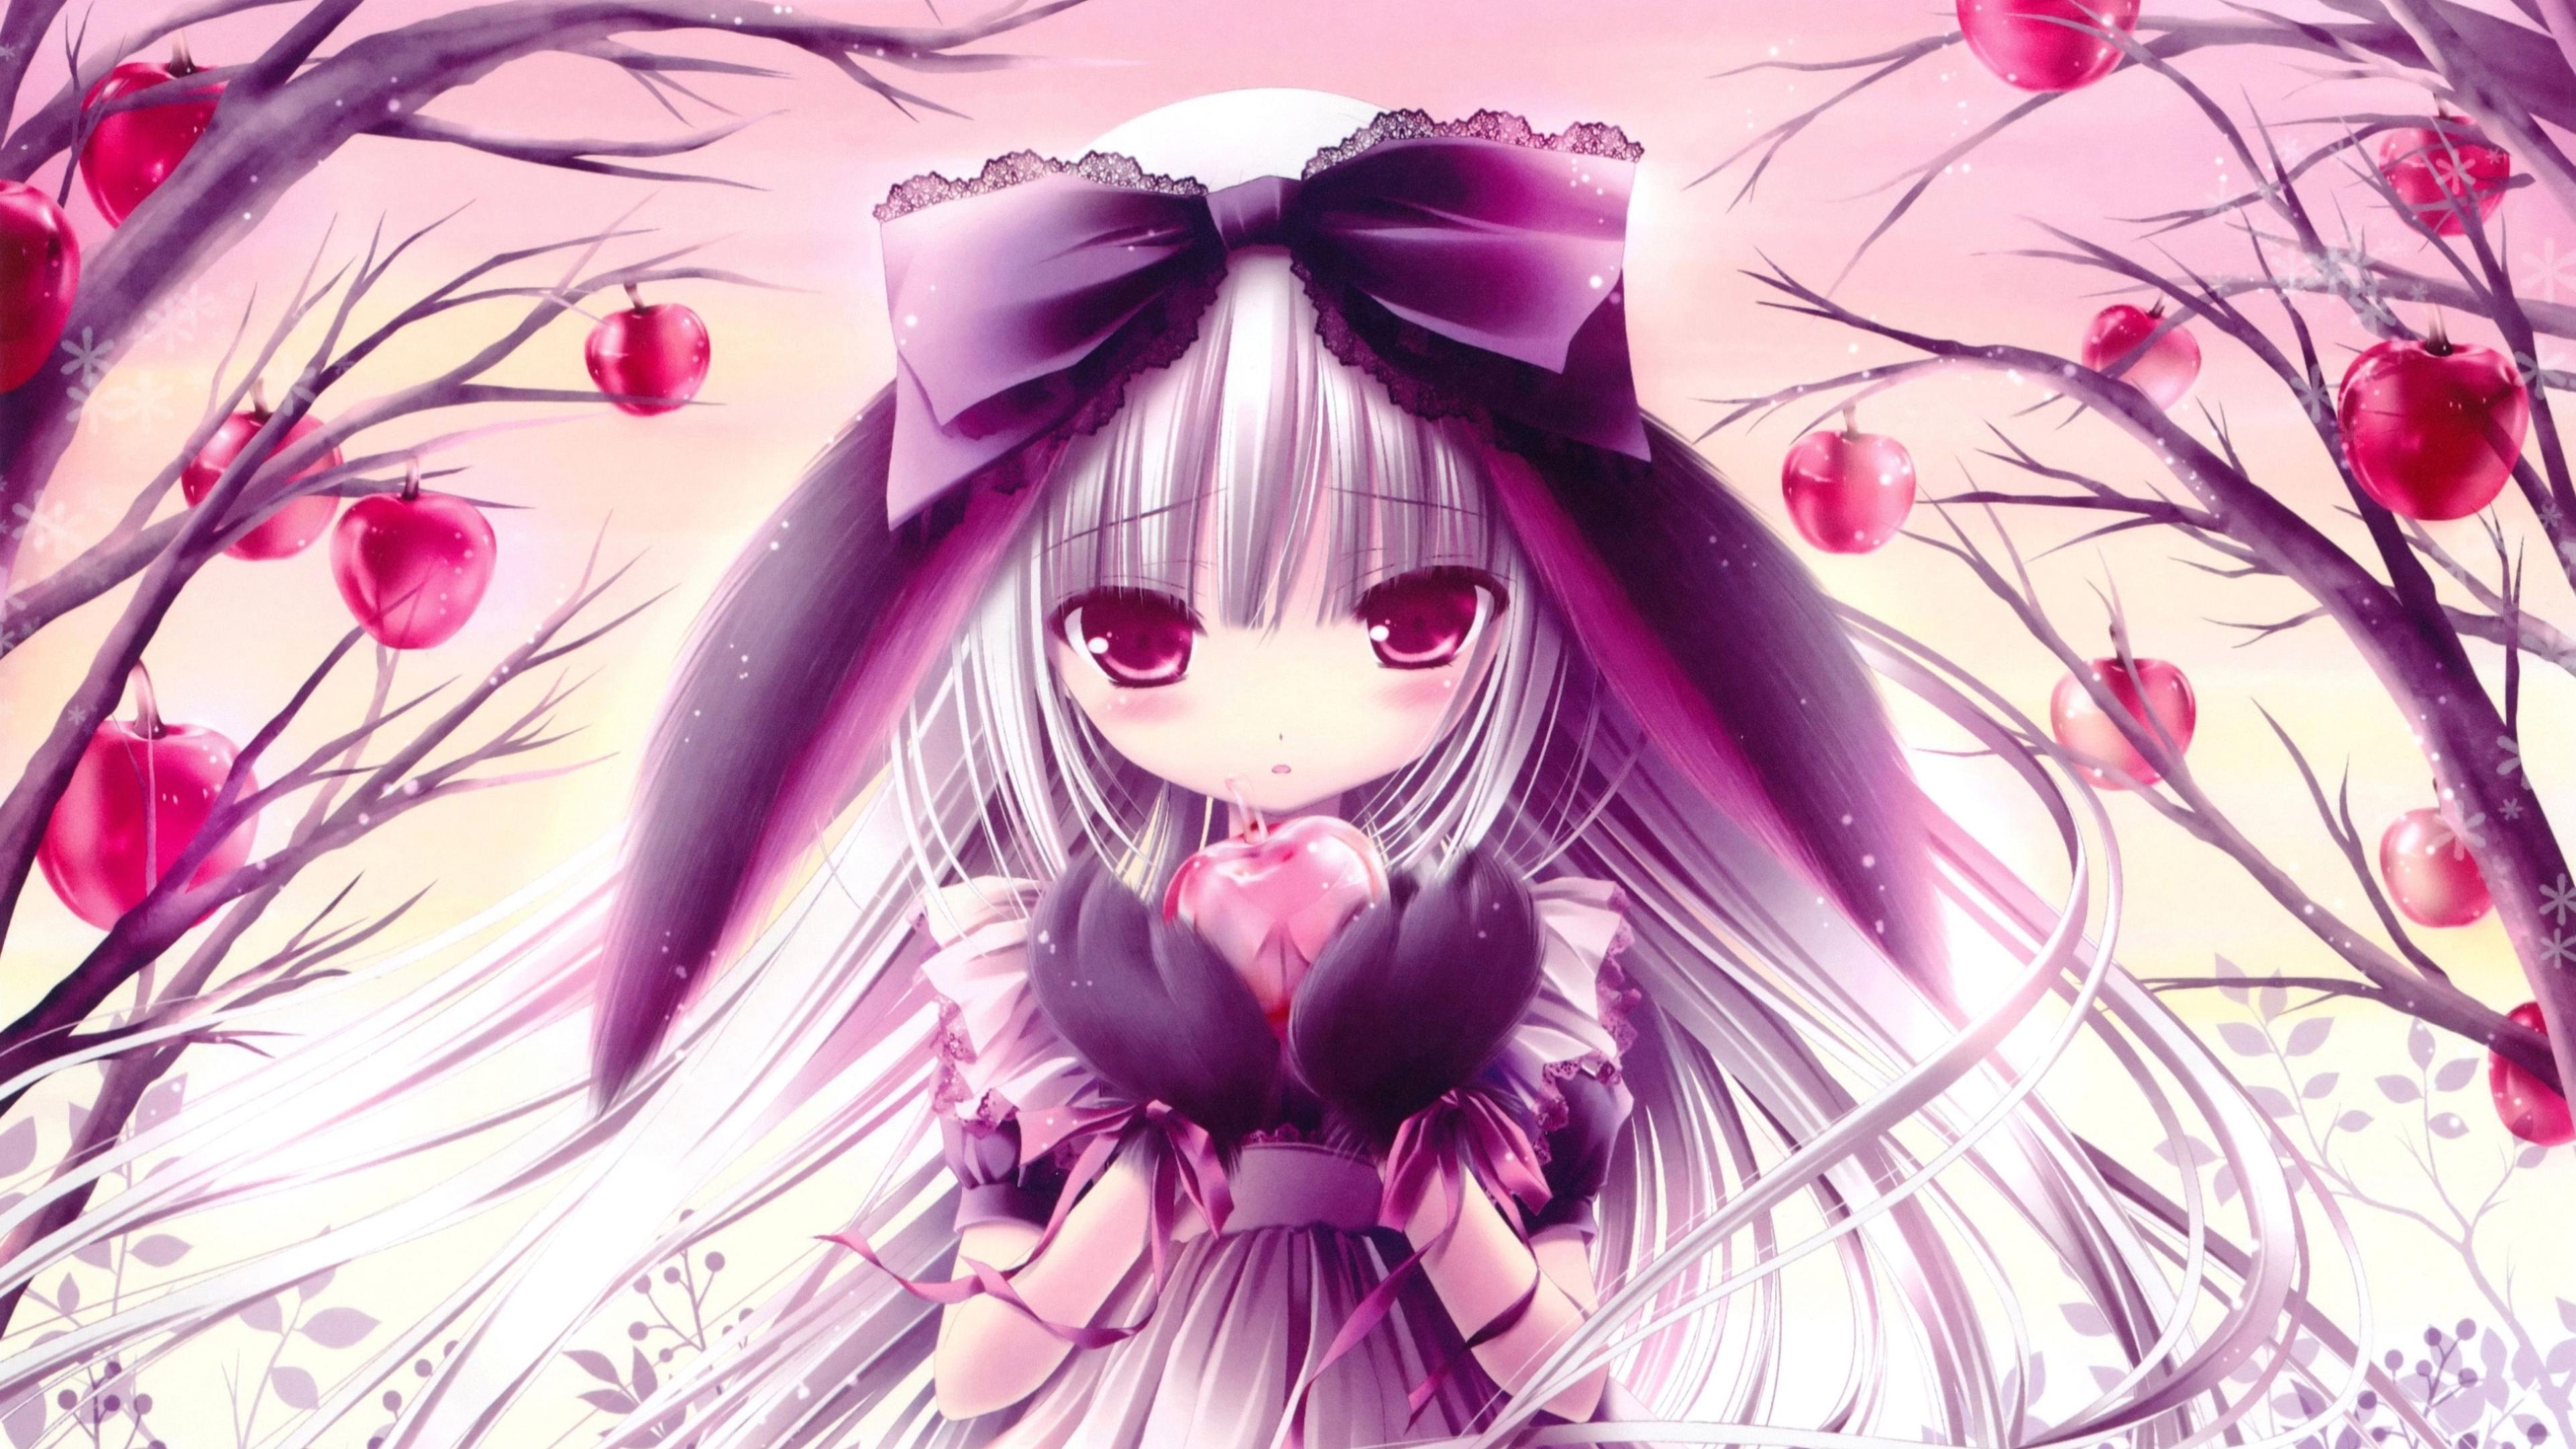 Pink Anime Desktop Wallpapers - Wallpaper Cave